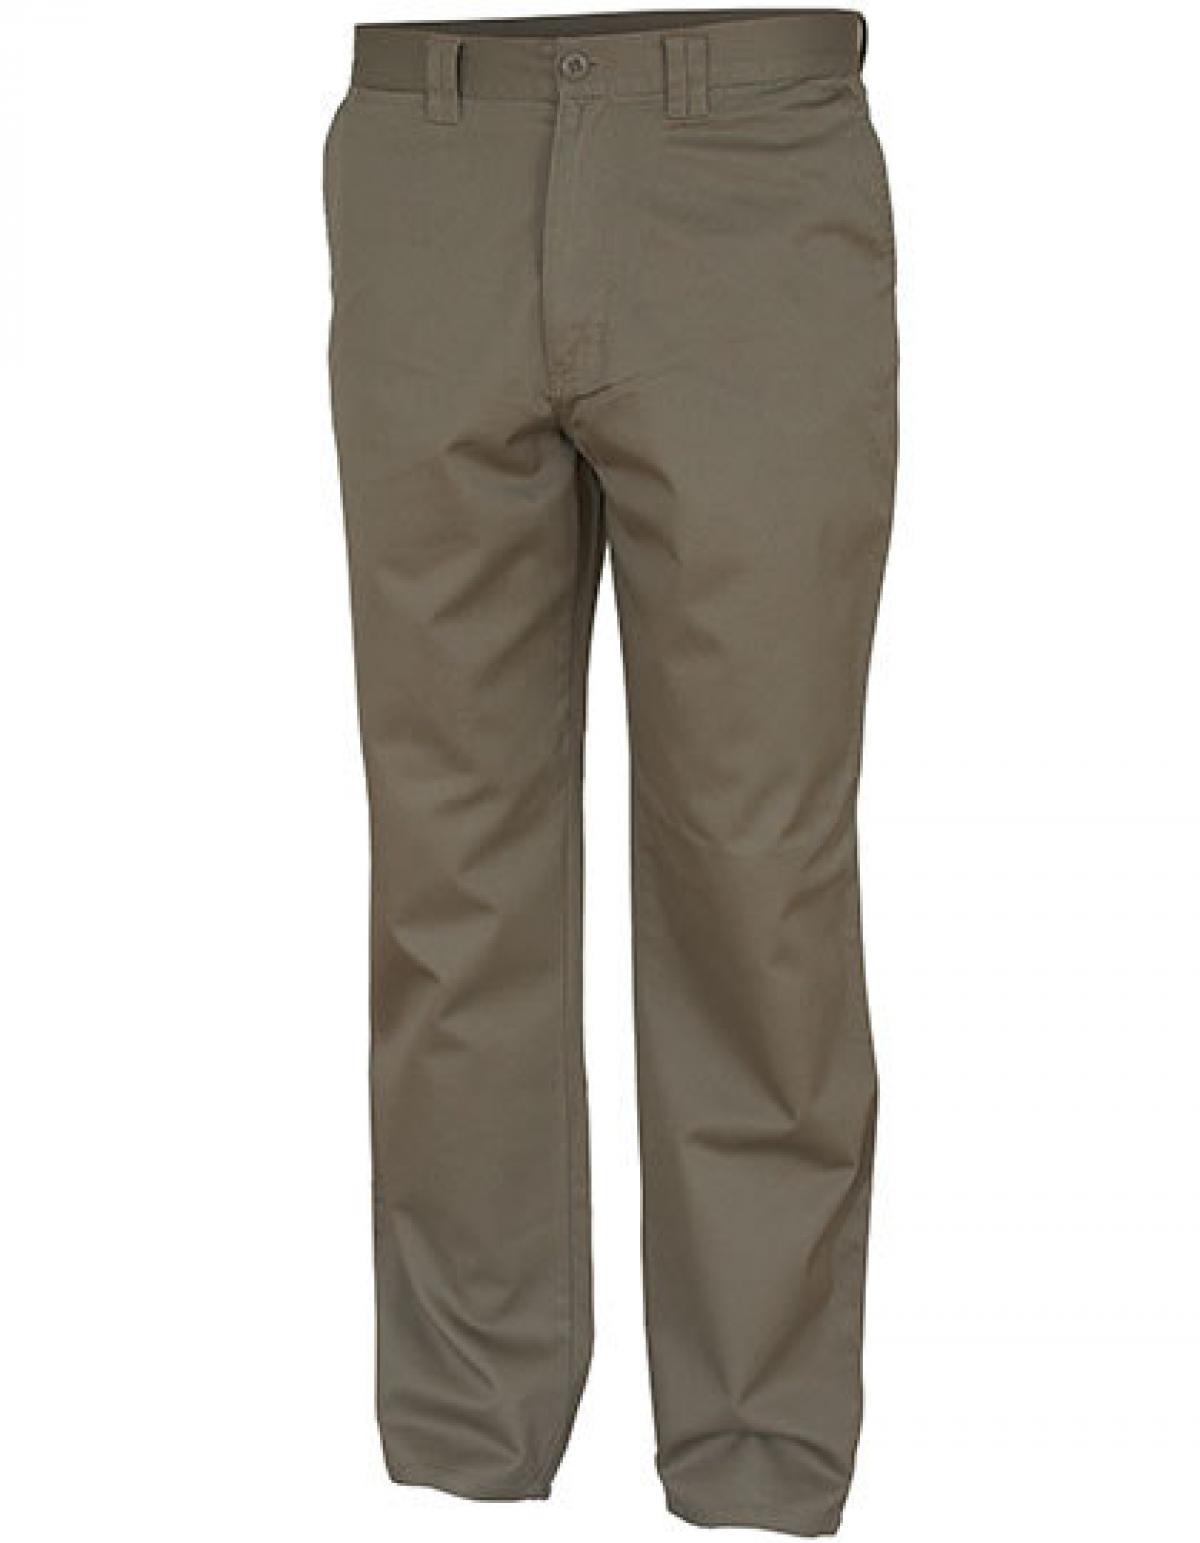 classic khaki pants bei 60 grad waschbar rexlander s. Black Bedroom Furniture Sets. Home Design Ideas